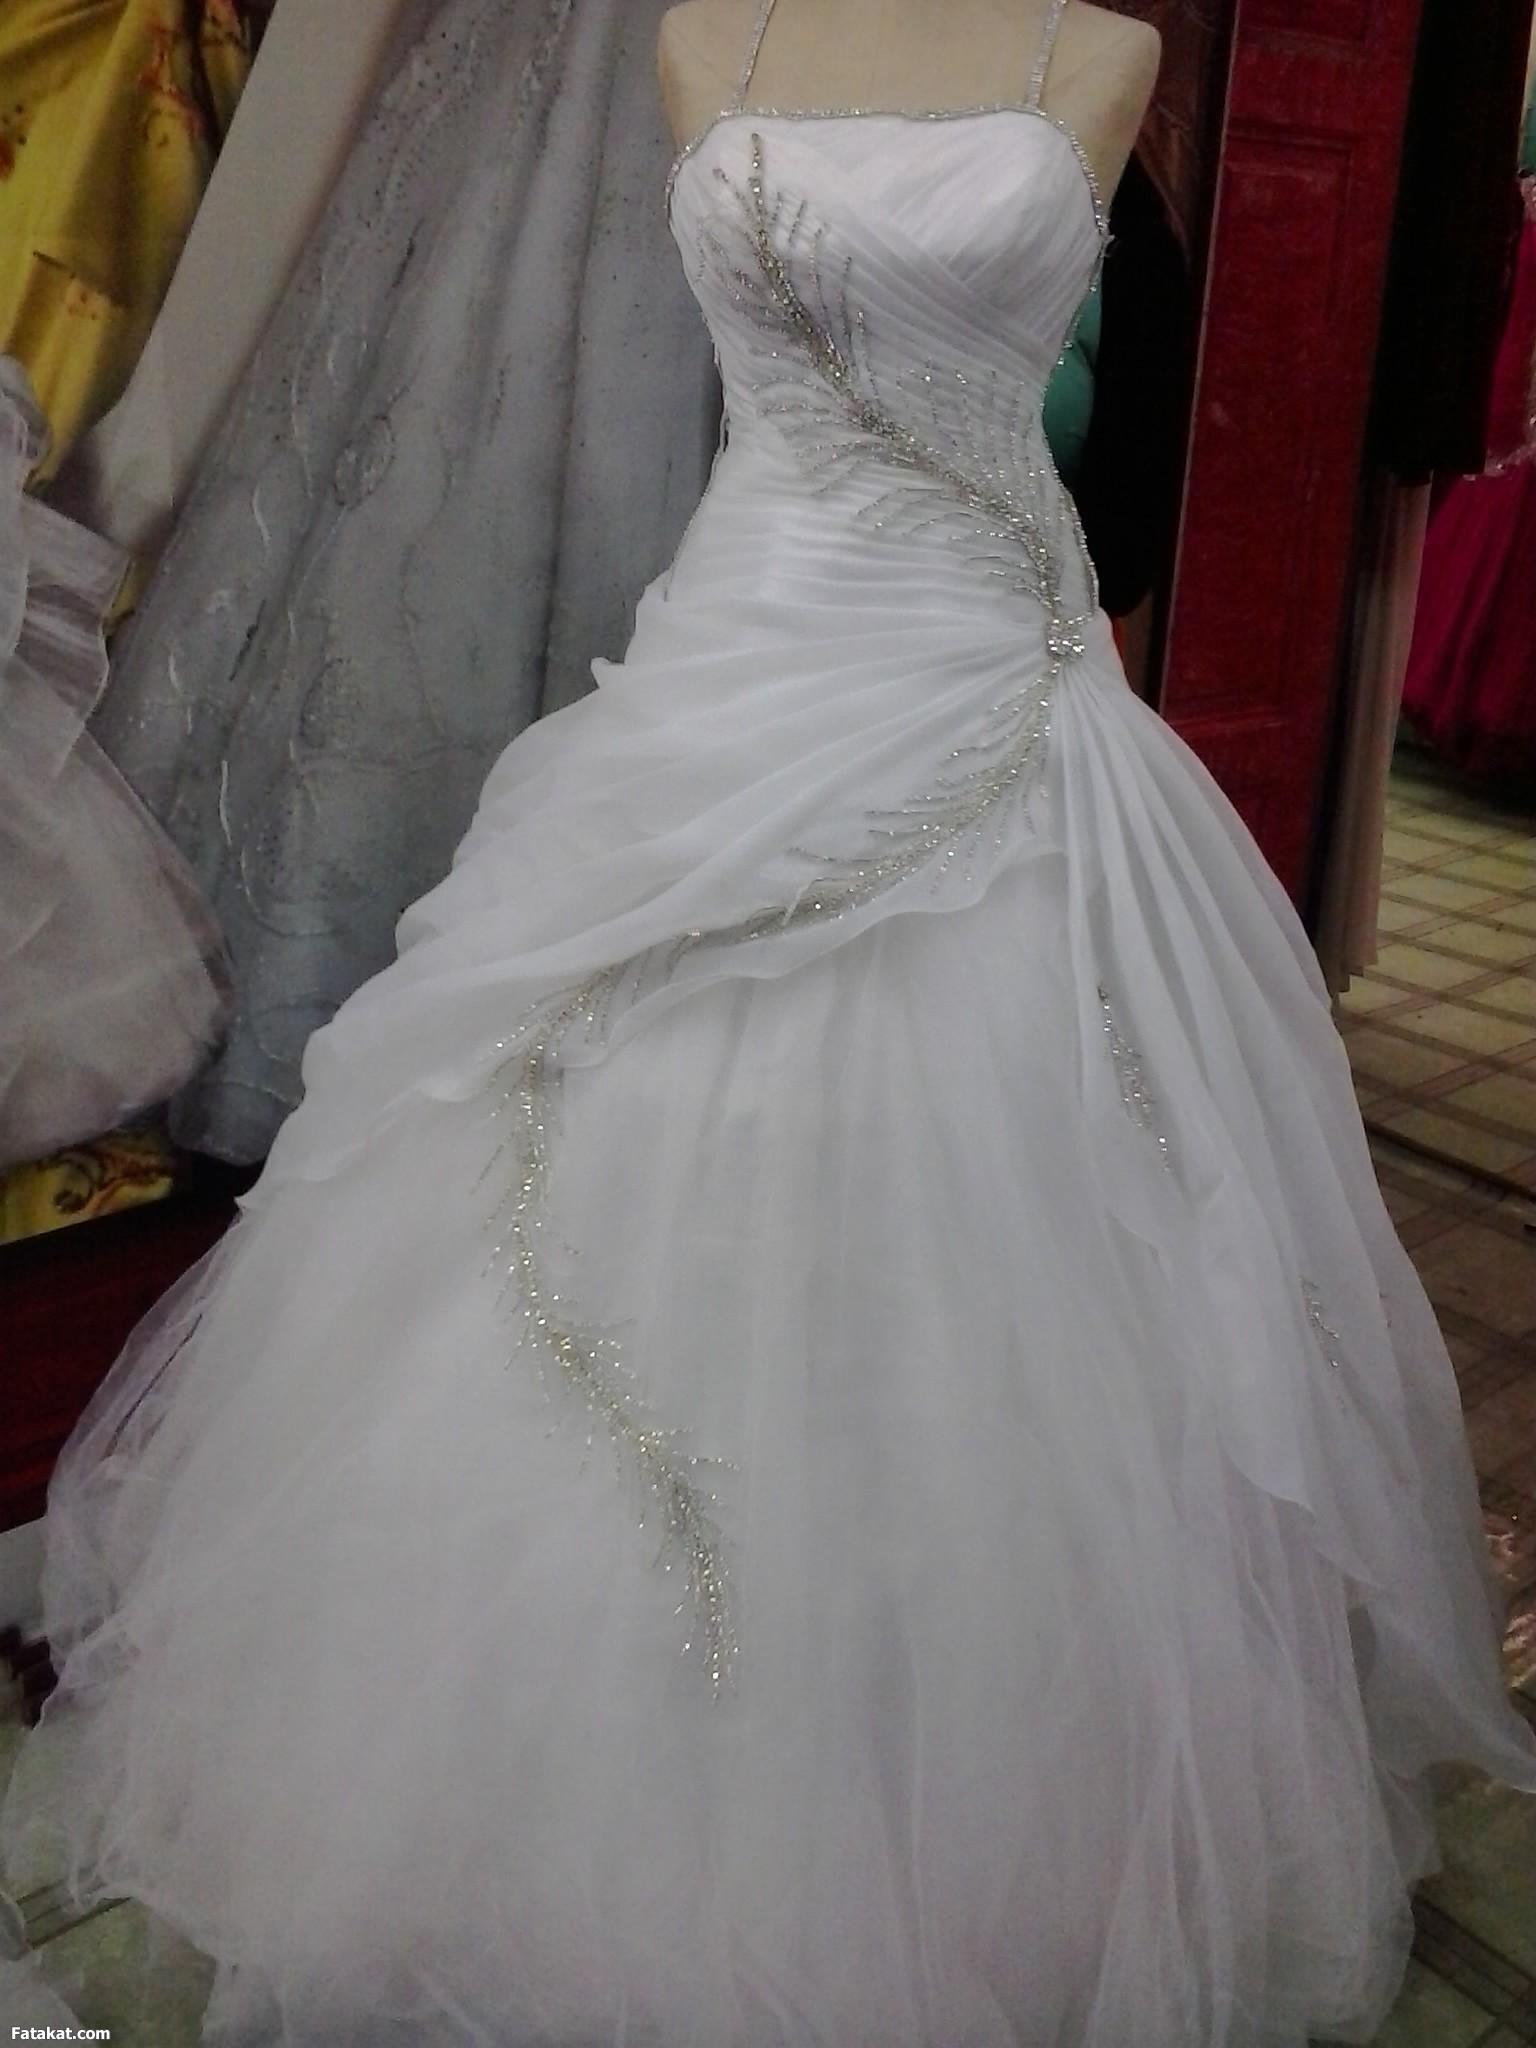 بالصور فساتين افراح للمحجبات , احلى فستان عروسه 1025 9